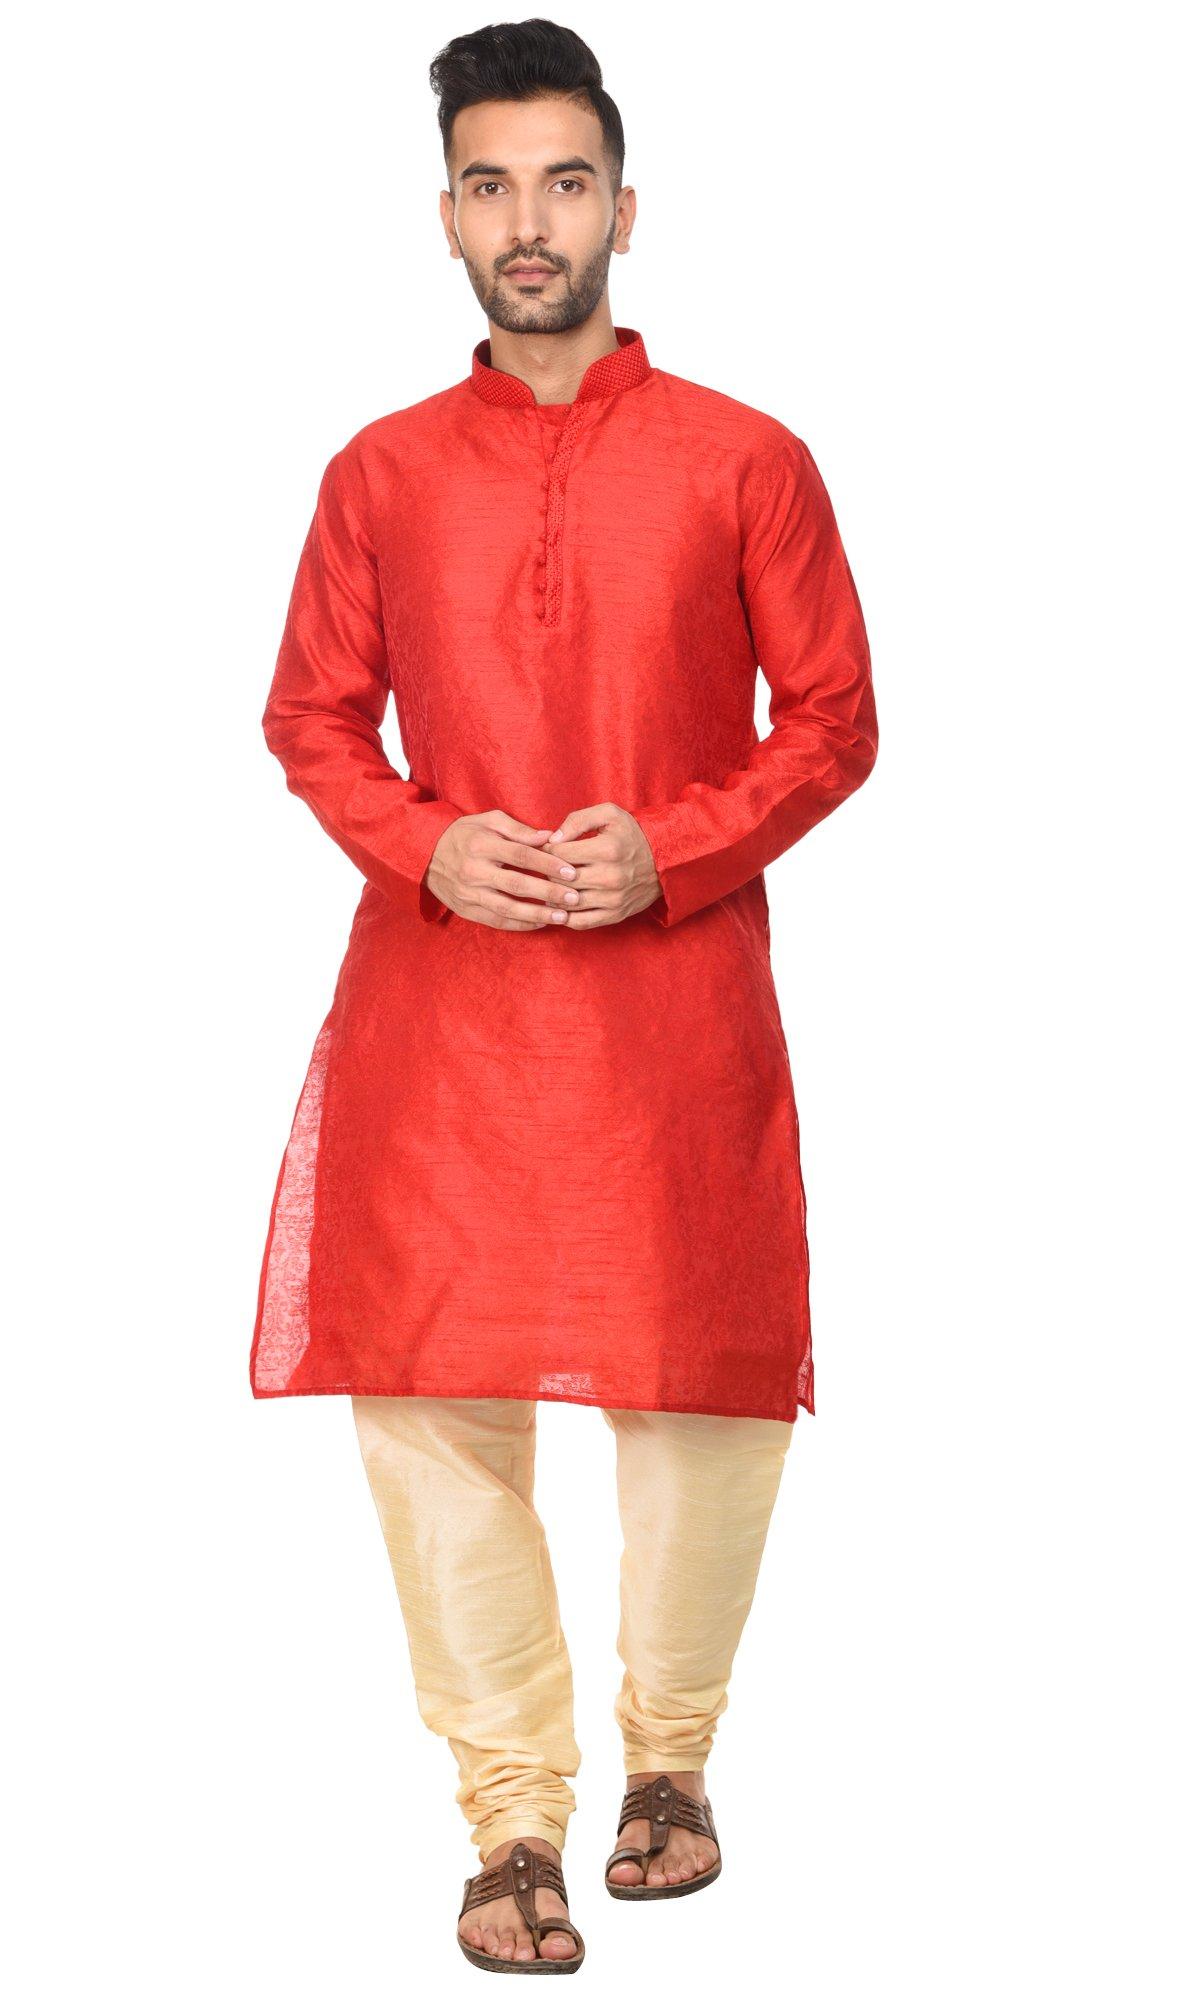 Long Sleeve Shirt Embroidered Mens Kurta Pajama Set Red India Yoga Summer Dress -L